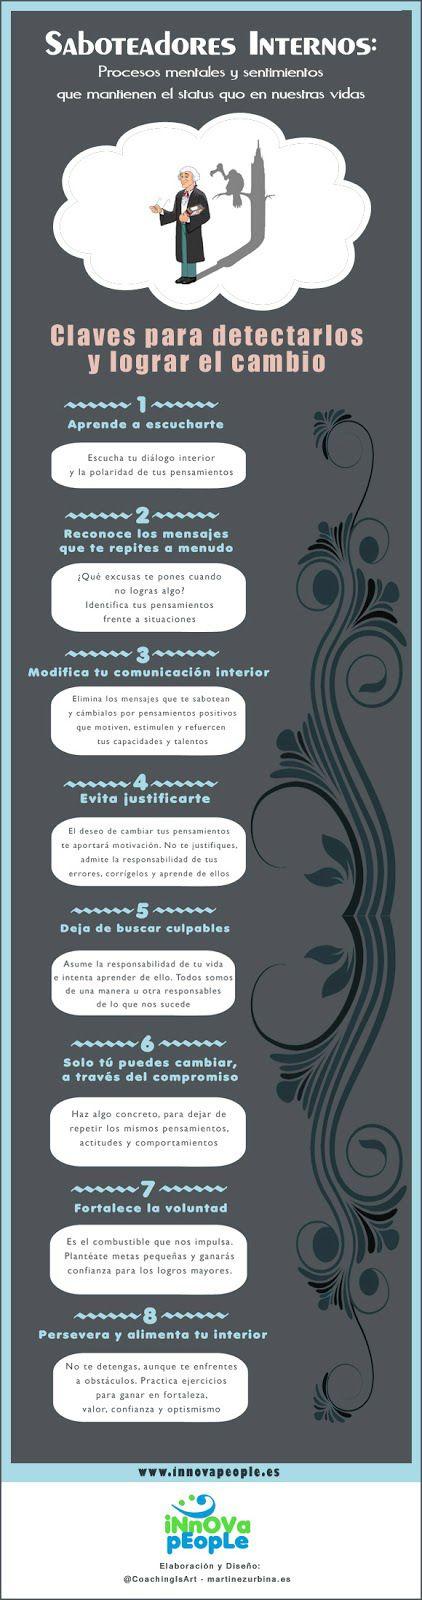 Saboteadores internos #infografia #infographic #psychology